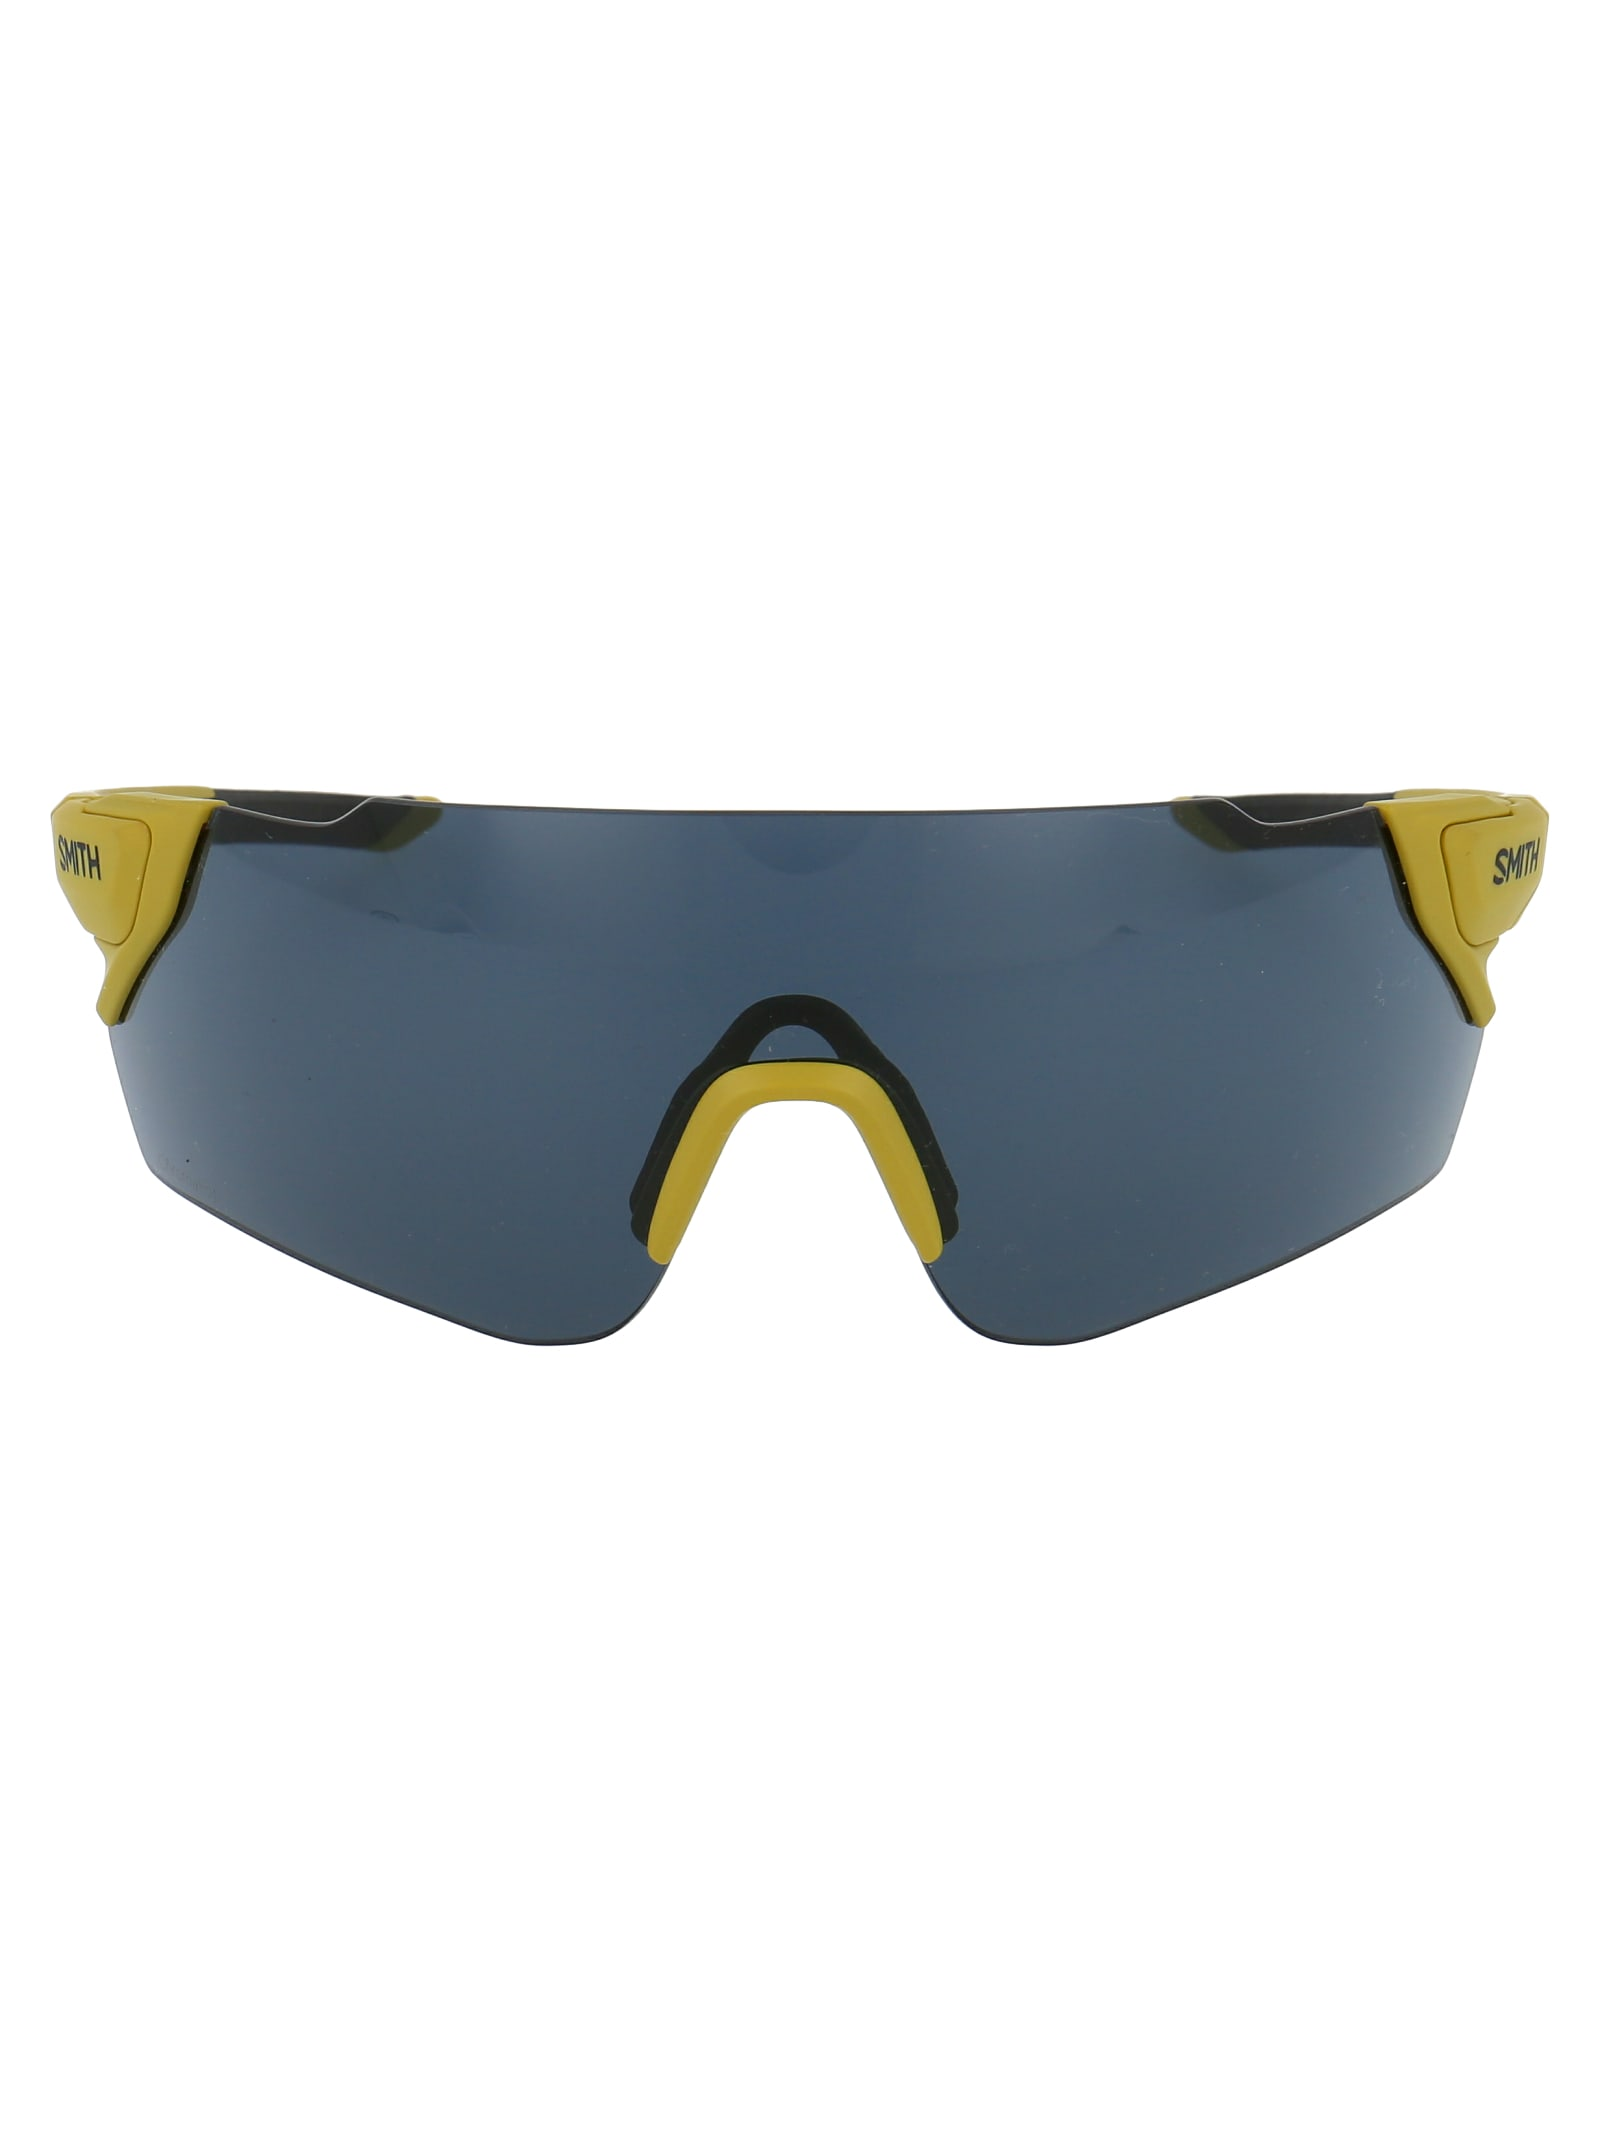 Smith Sunglasses SUNGLASSES